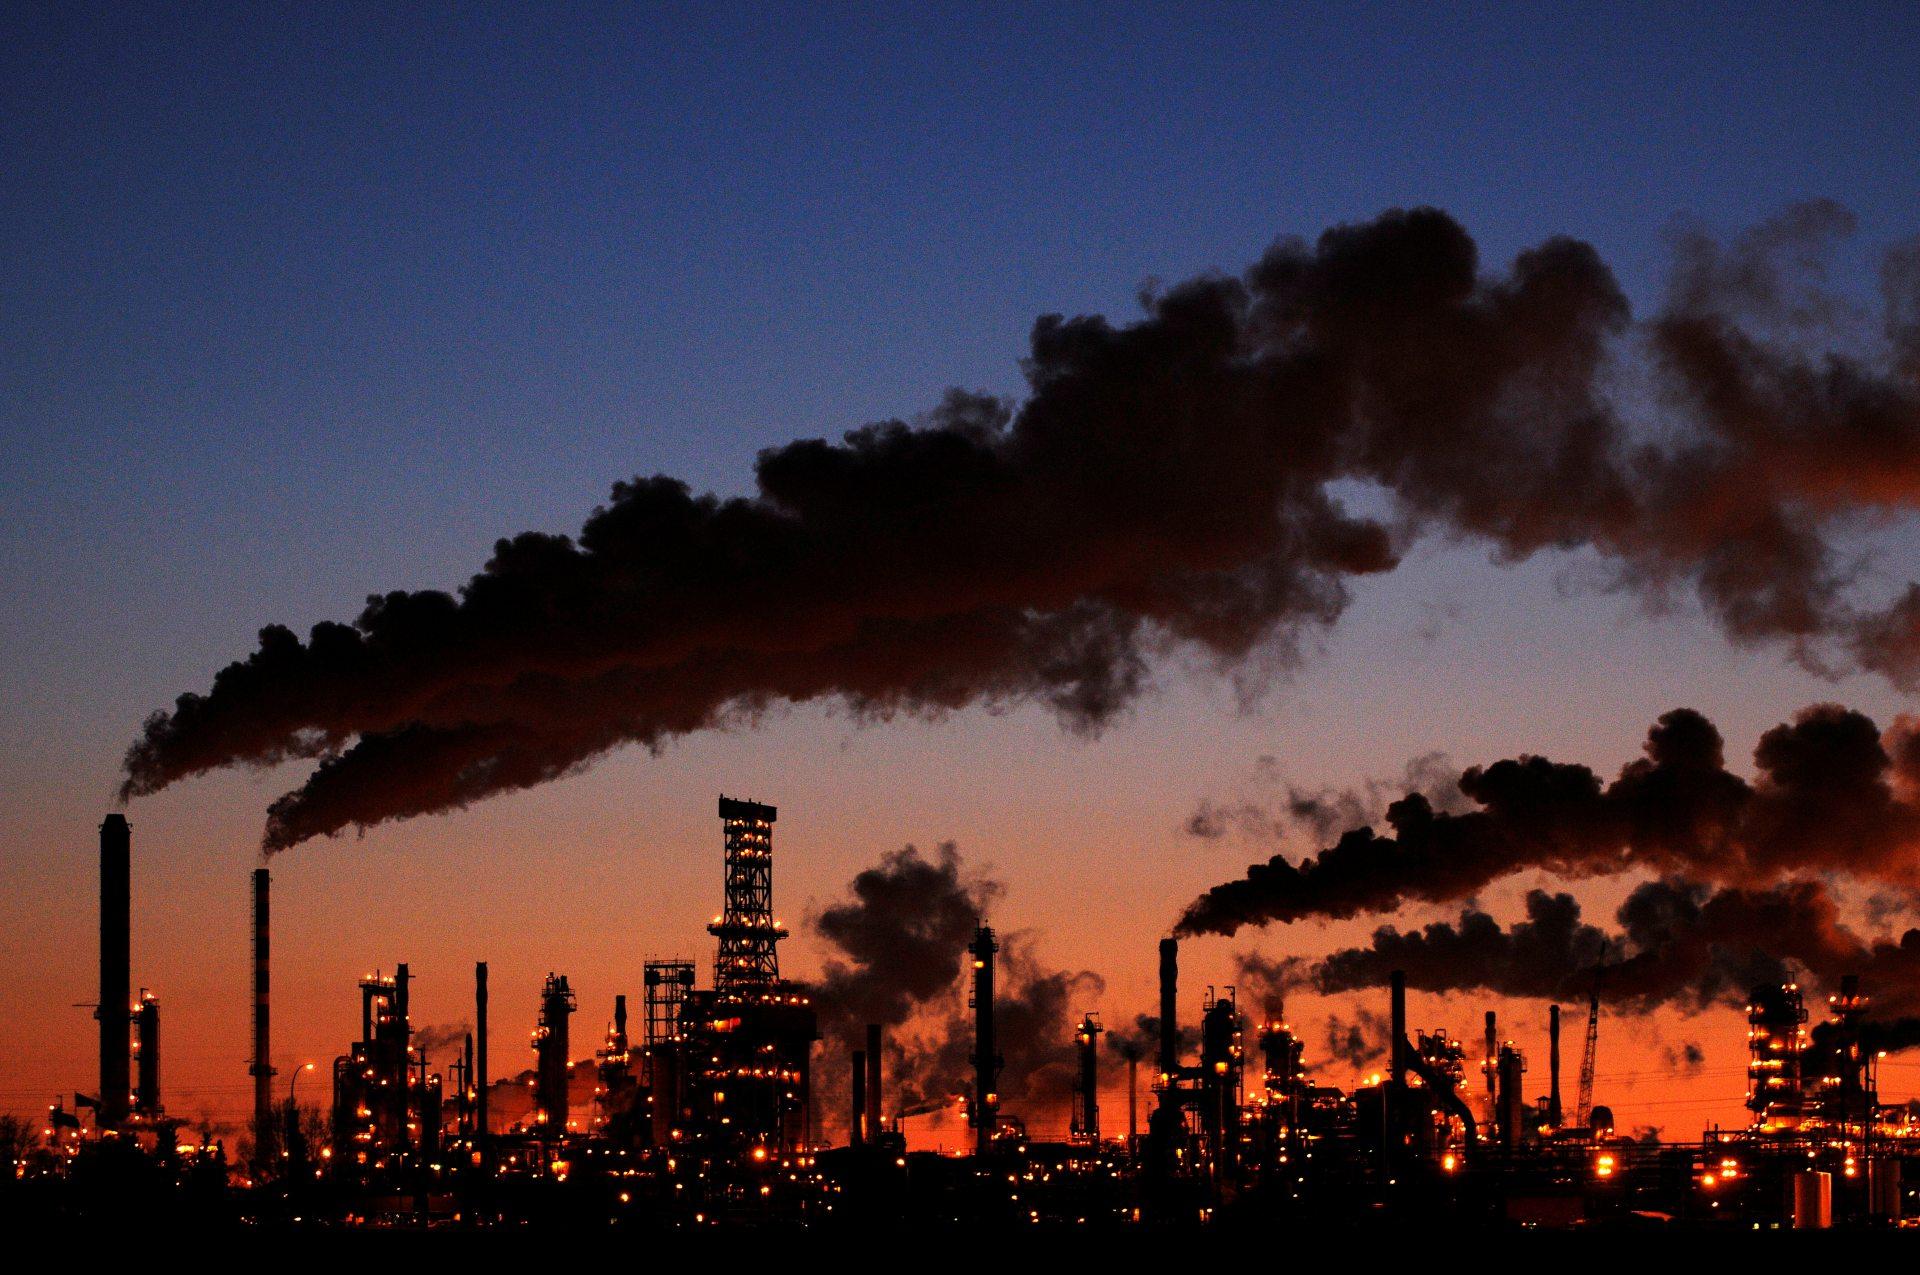 Central de carbono productora de energía de combustibles fósiles. - Dan Riedlhuber/Reuters